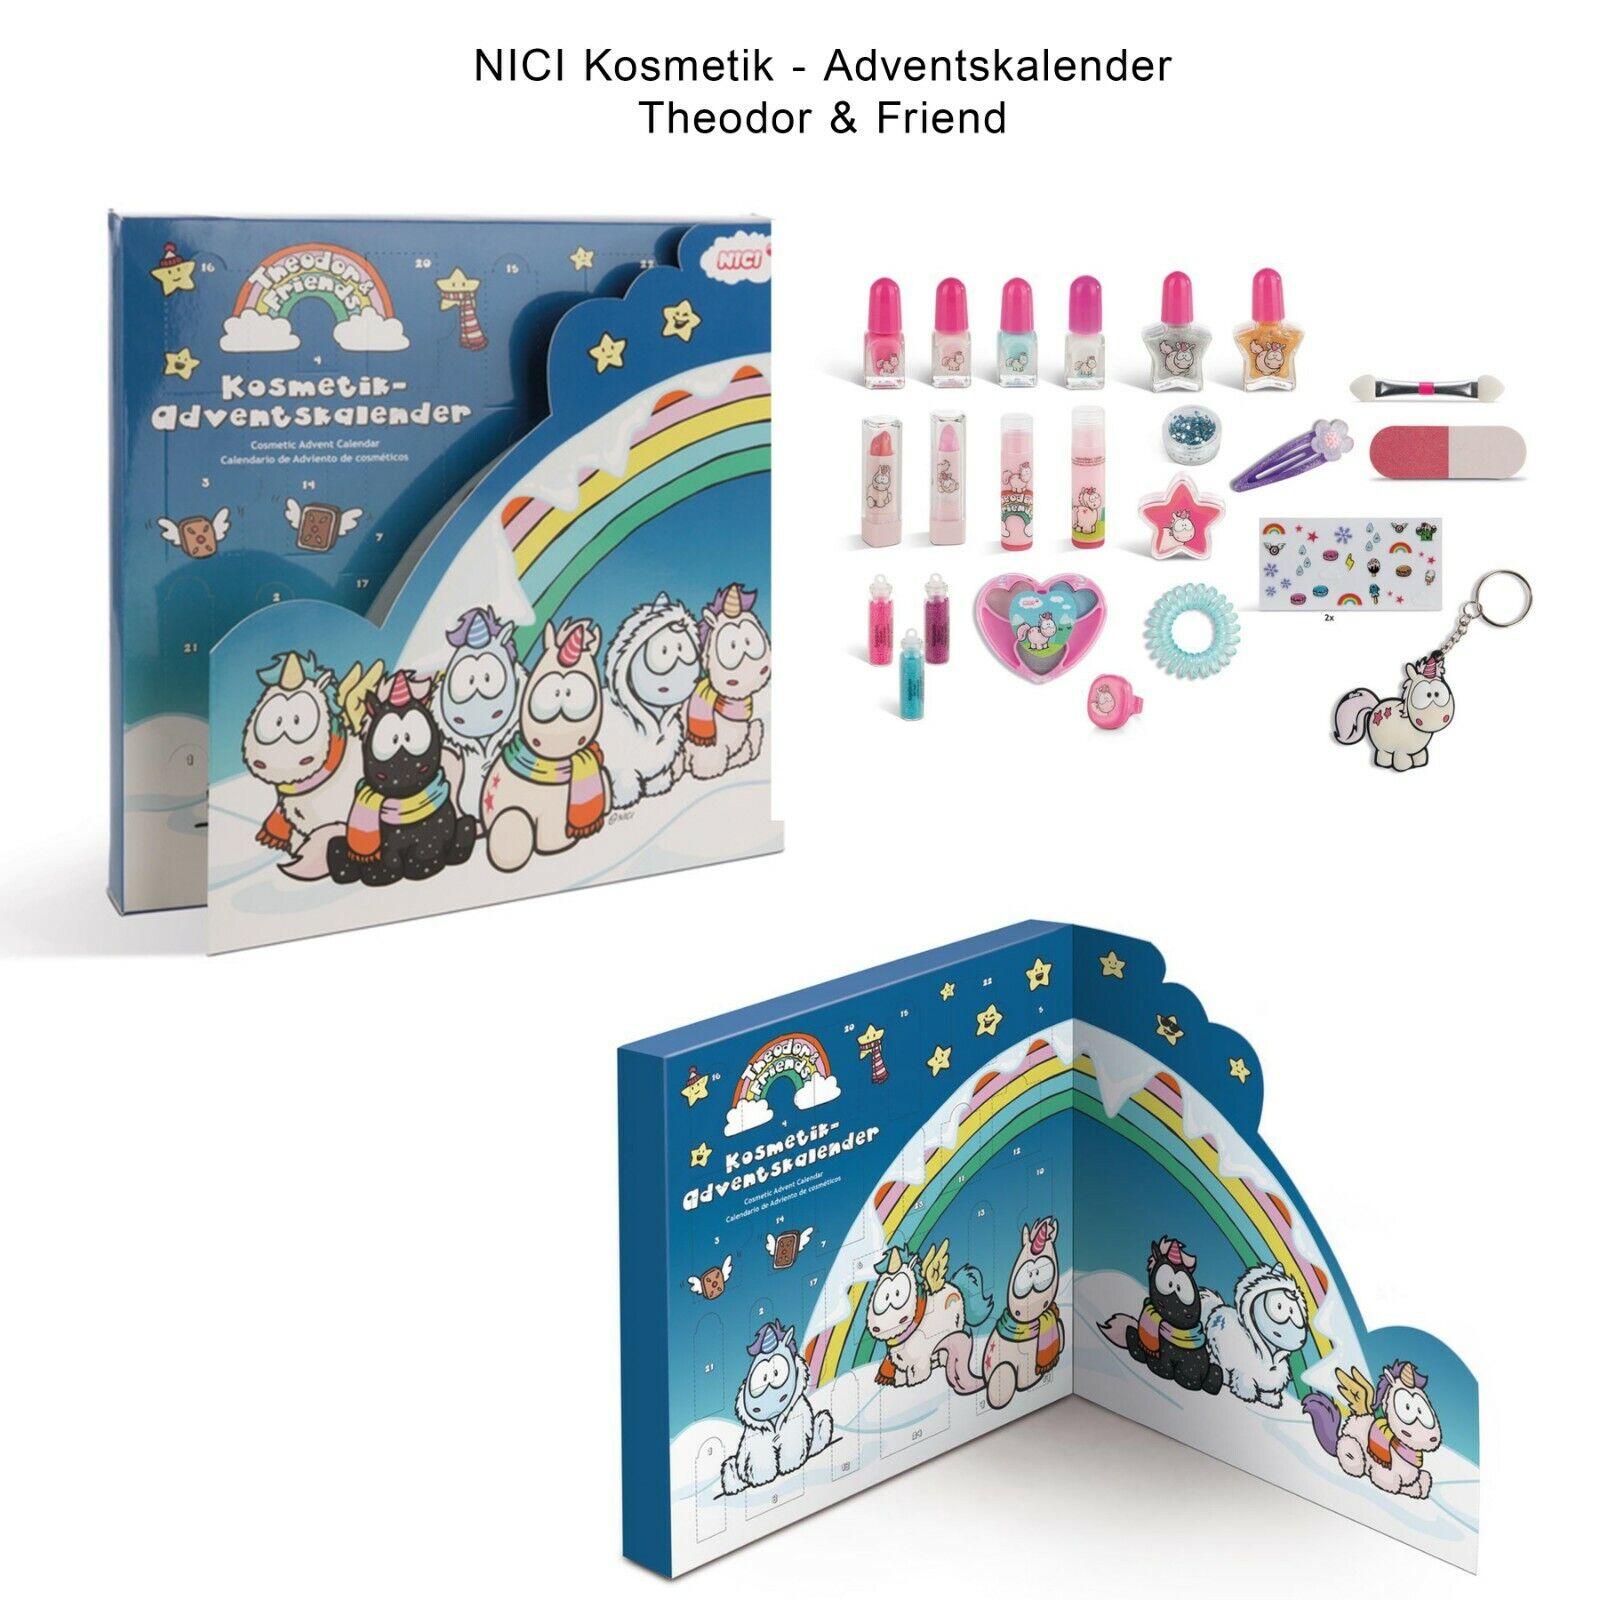 NICI Kosmetik Adventskalender Einhörner Weihnachtskalender Beauty Mädchen Kinder